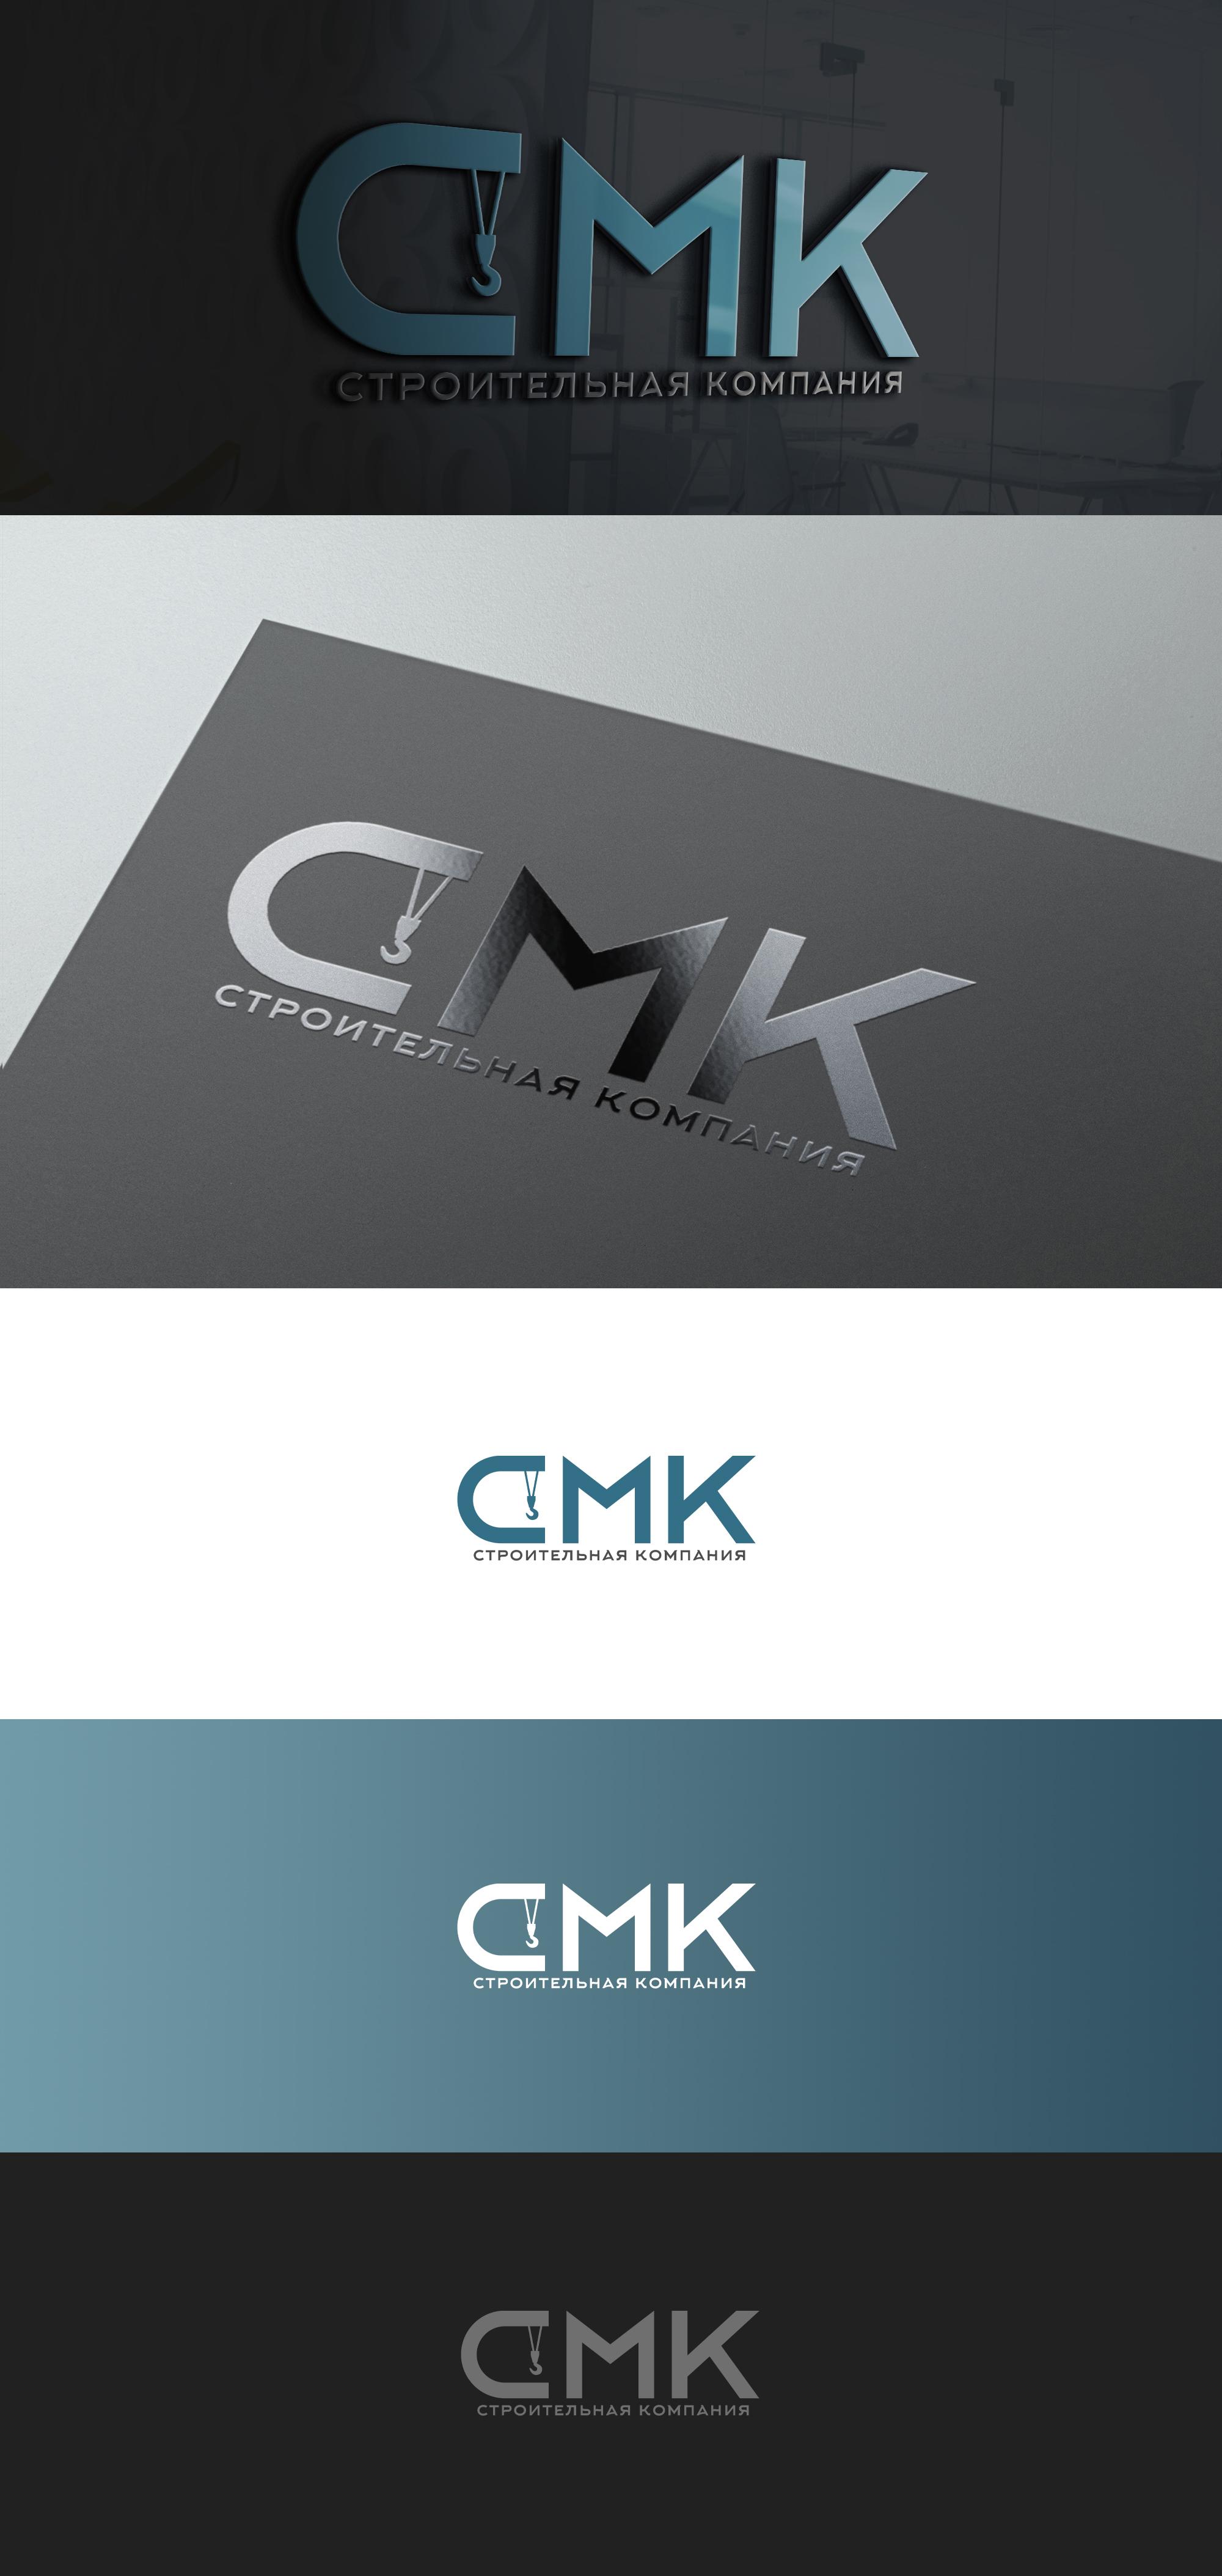 Разработка логотипа компании фото f_0945dd06b4ade069.jpg